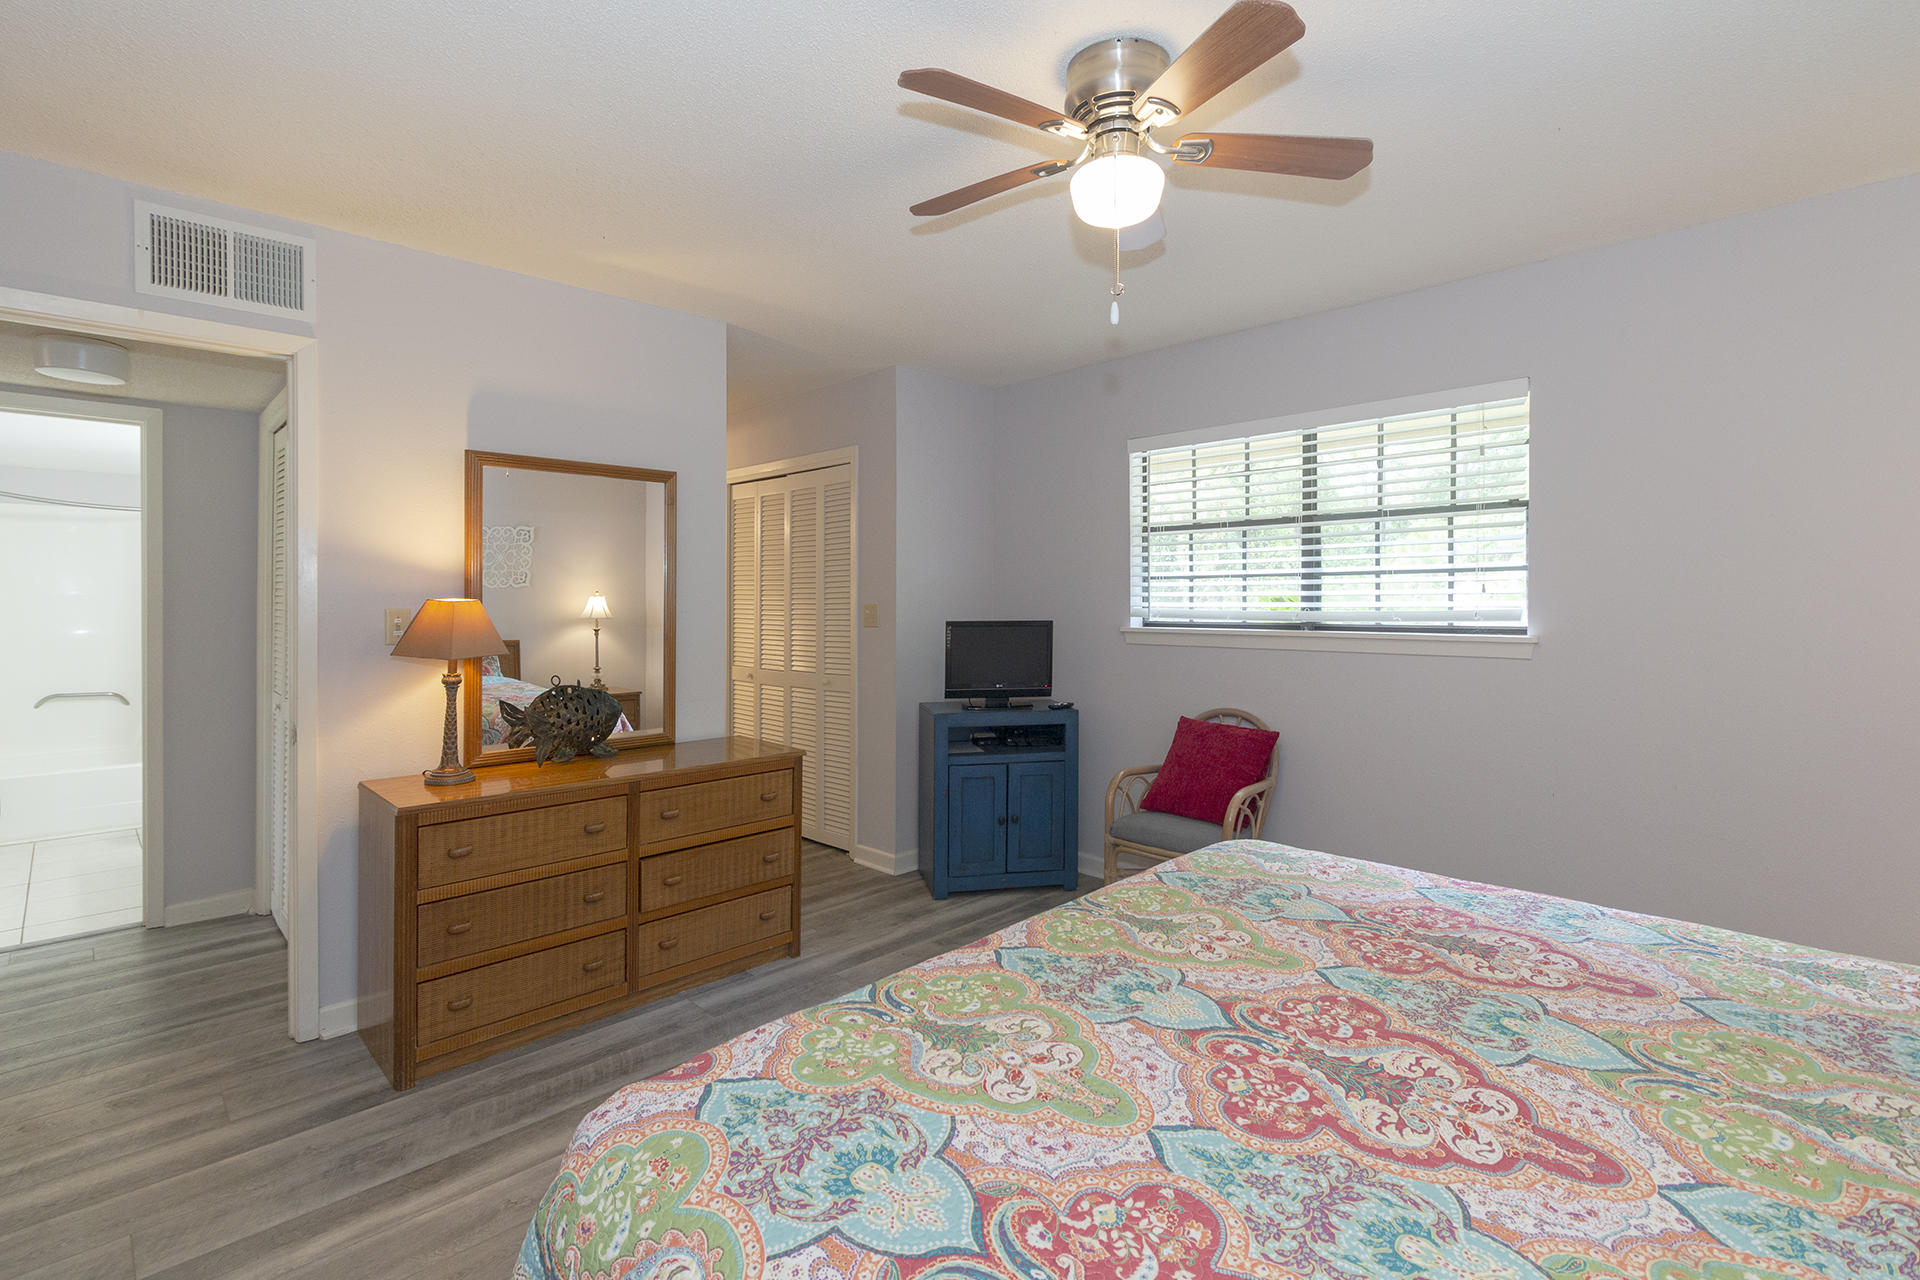 542 Driftwood Bay Drive - $239900